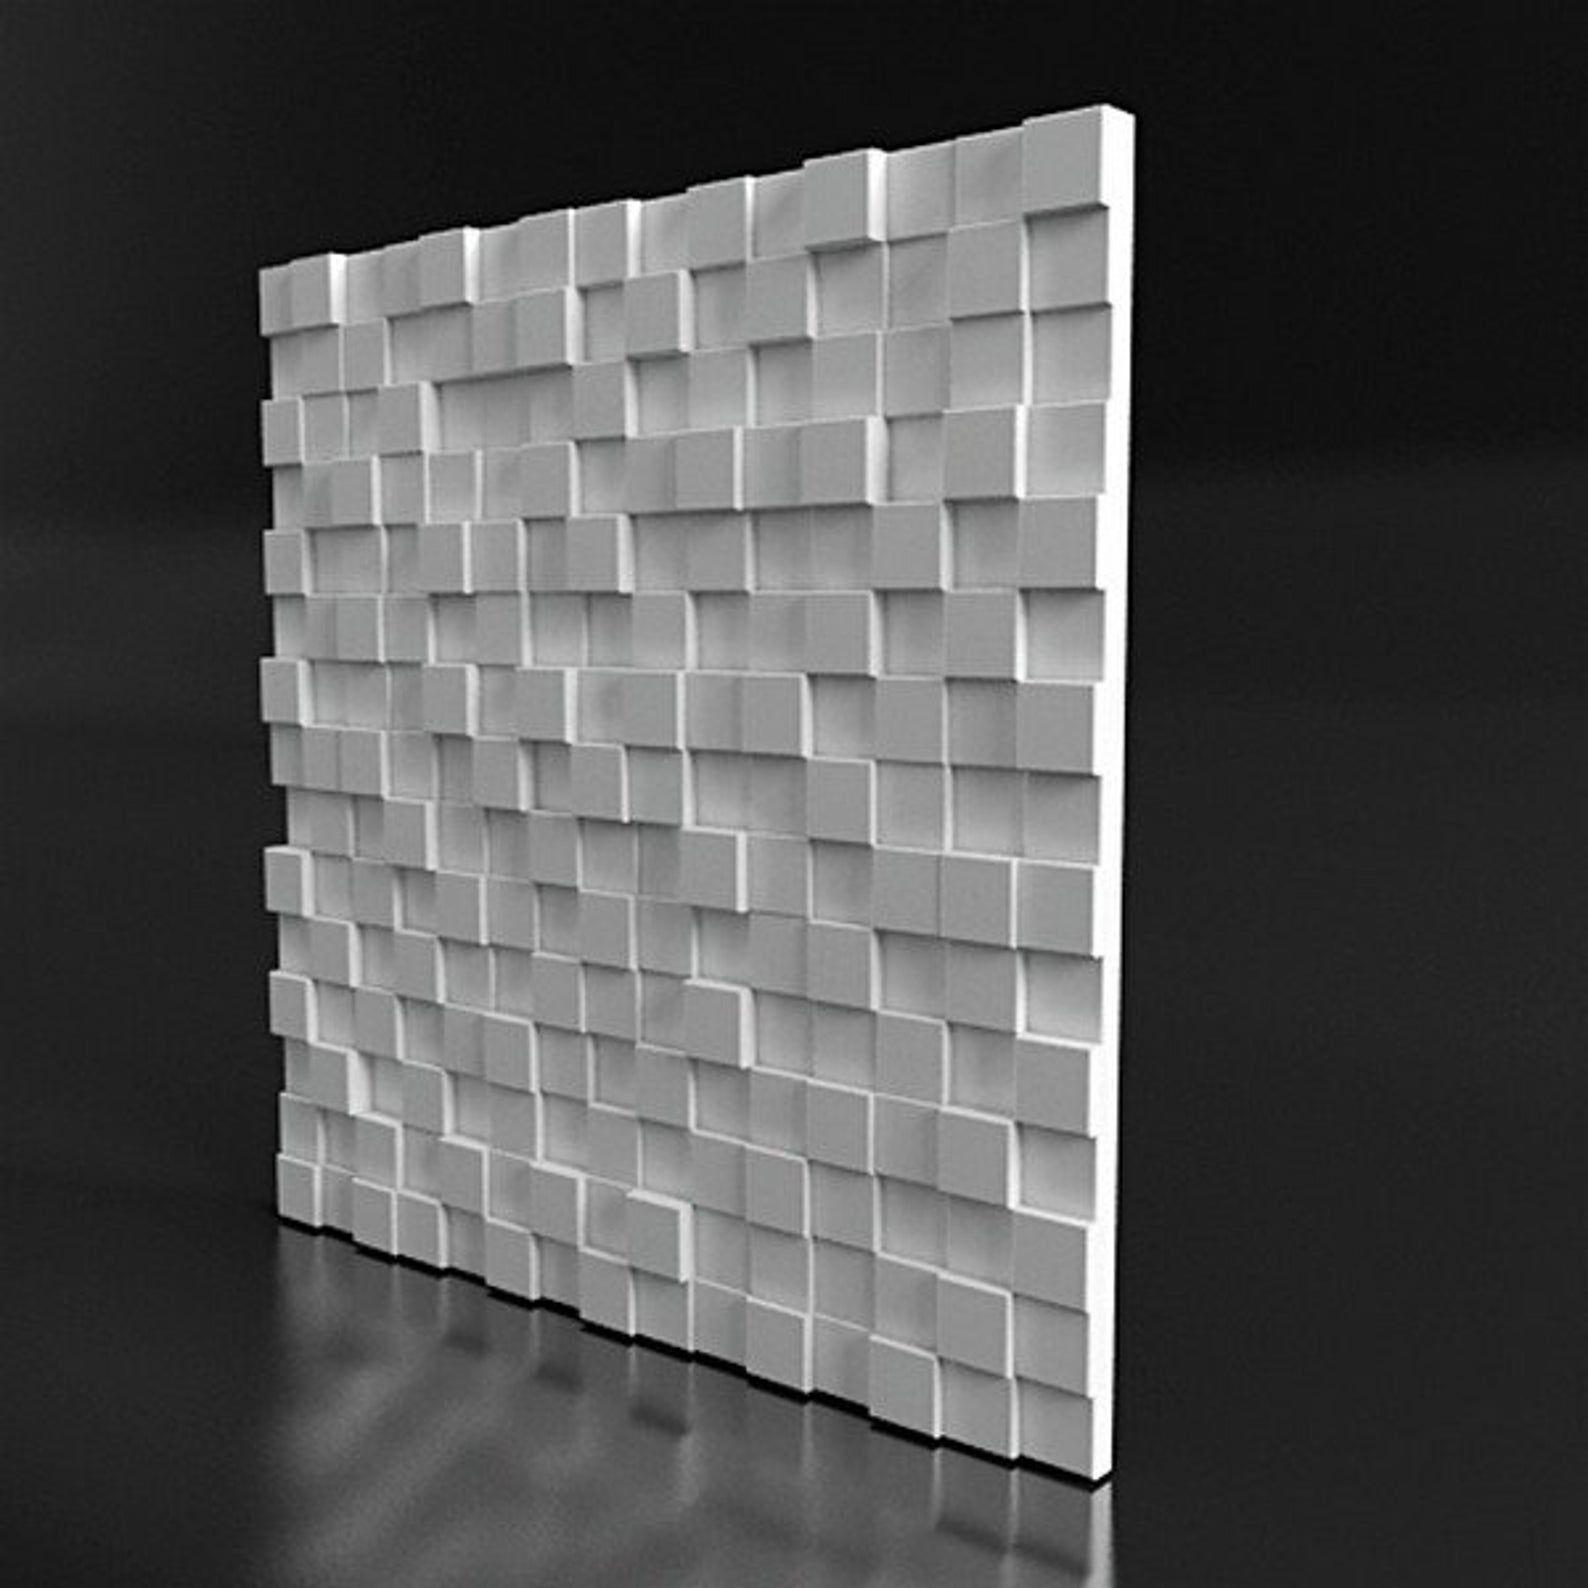 3d Wall Panels Decorative Wall 3d Panels Plastic Mold 3d Etsy In 2020 Wall Paneling Diy Plastic Wall Panels 3d Wall Panels